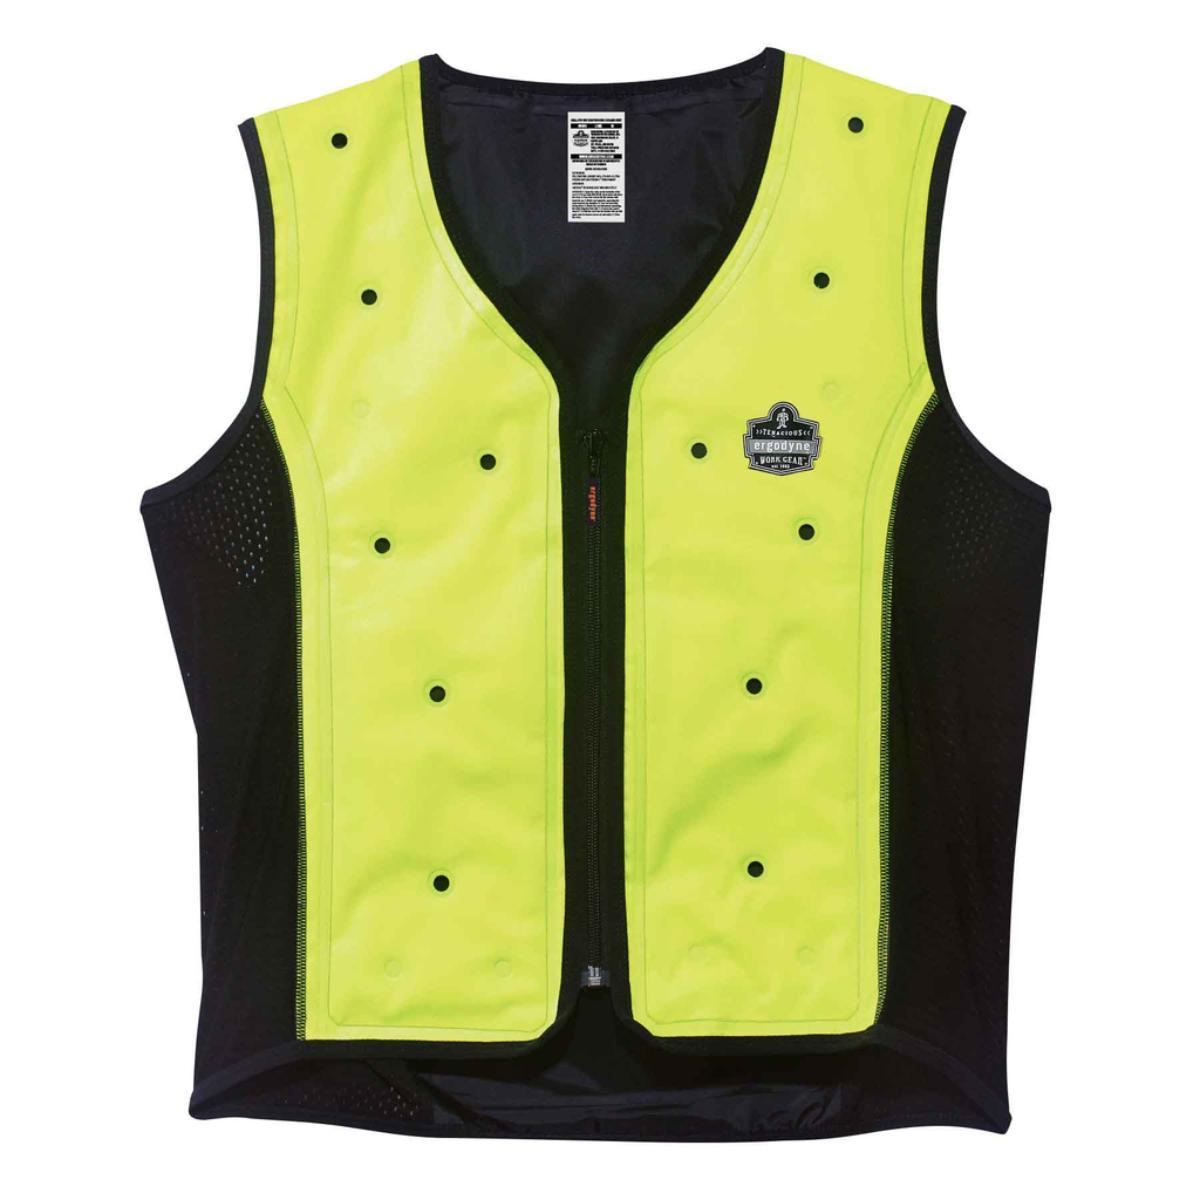 6685 L Lime Dry Evaporative Cooling Vest